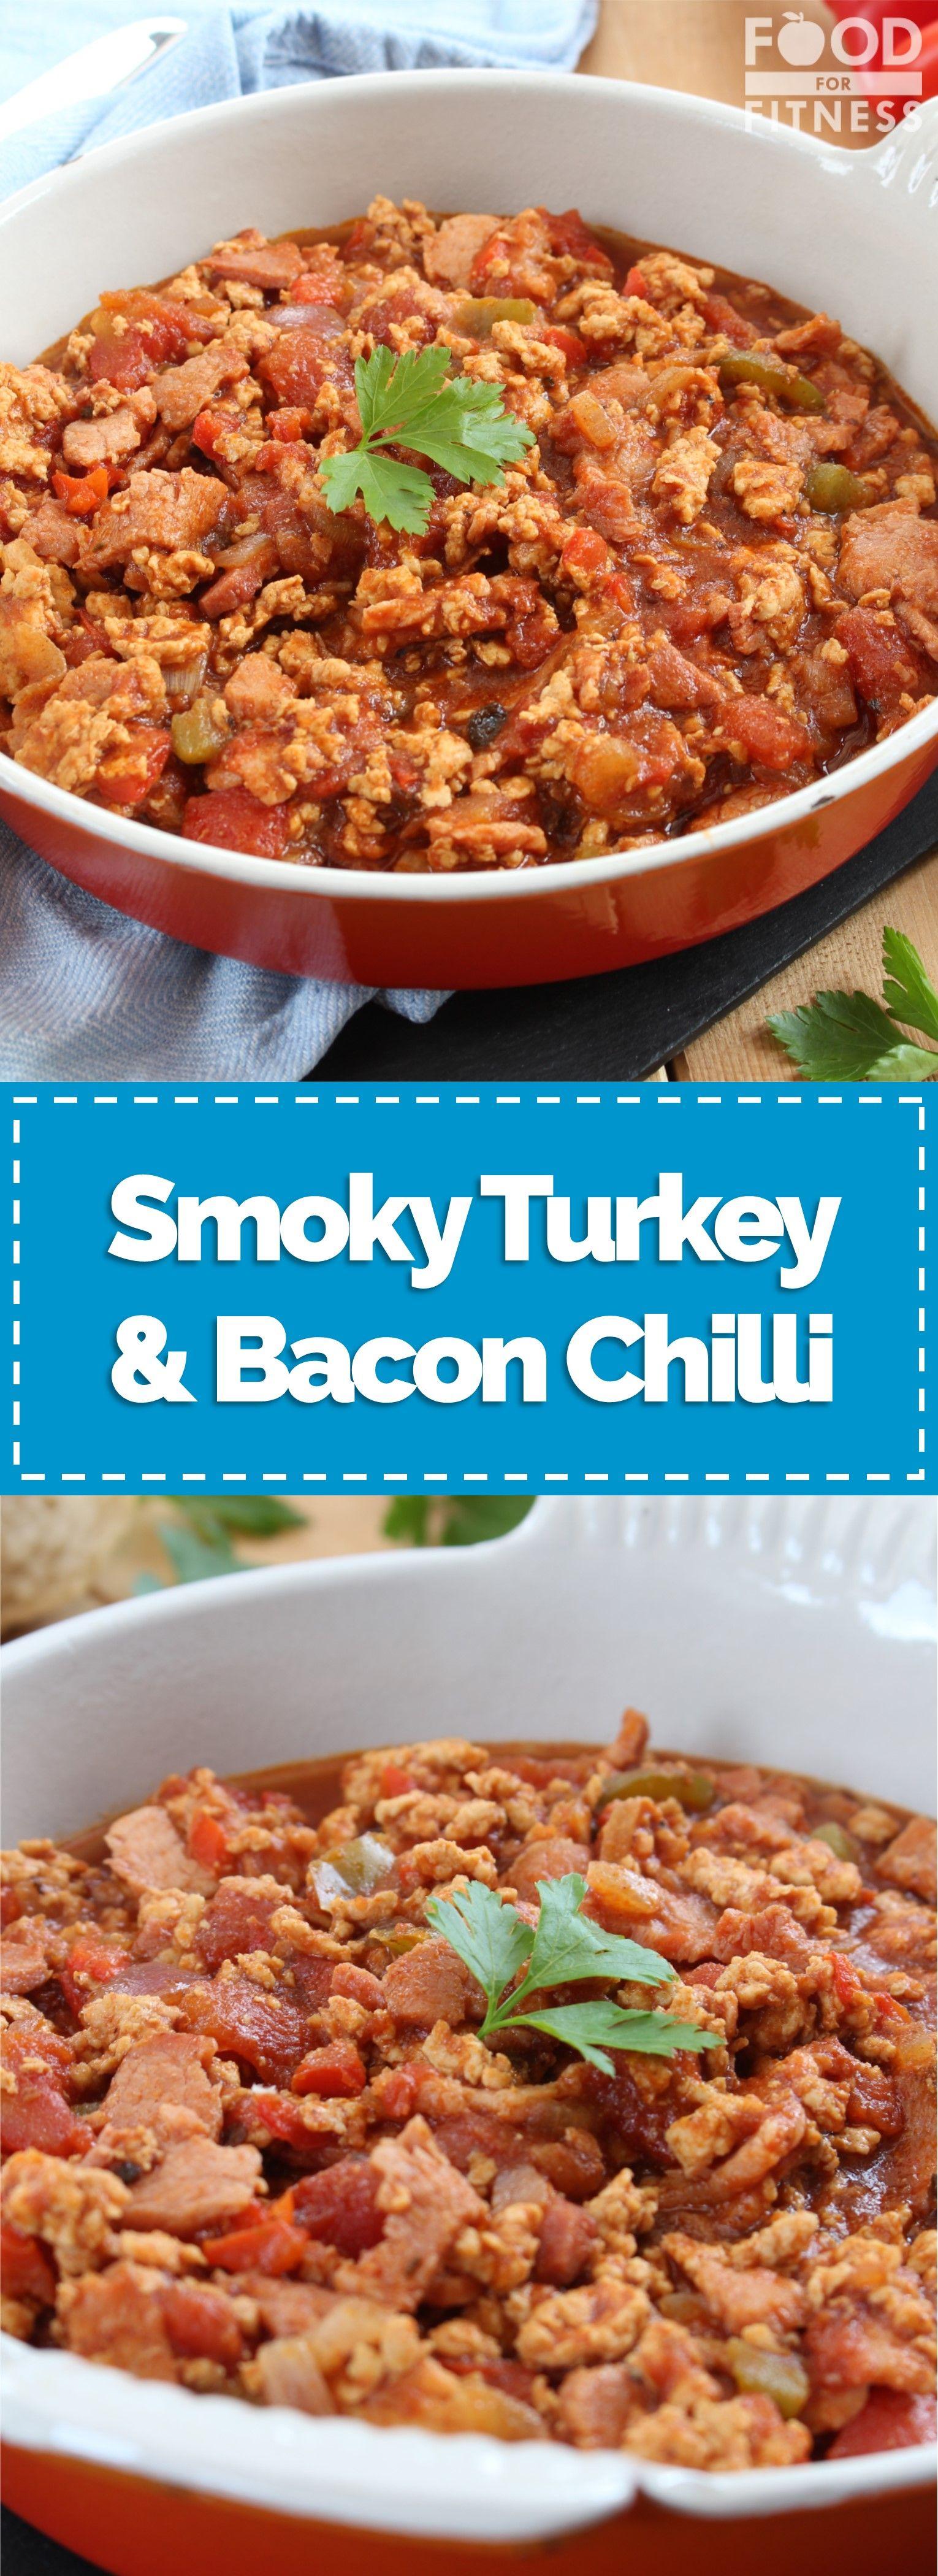 Bacon & Turkey Chilli | Recipe | Turkey chilli, Turkey ...